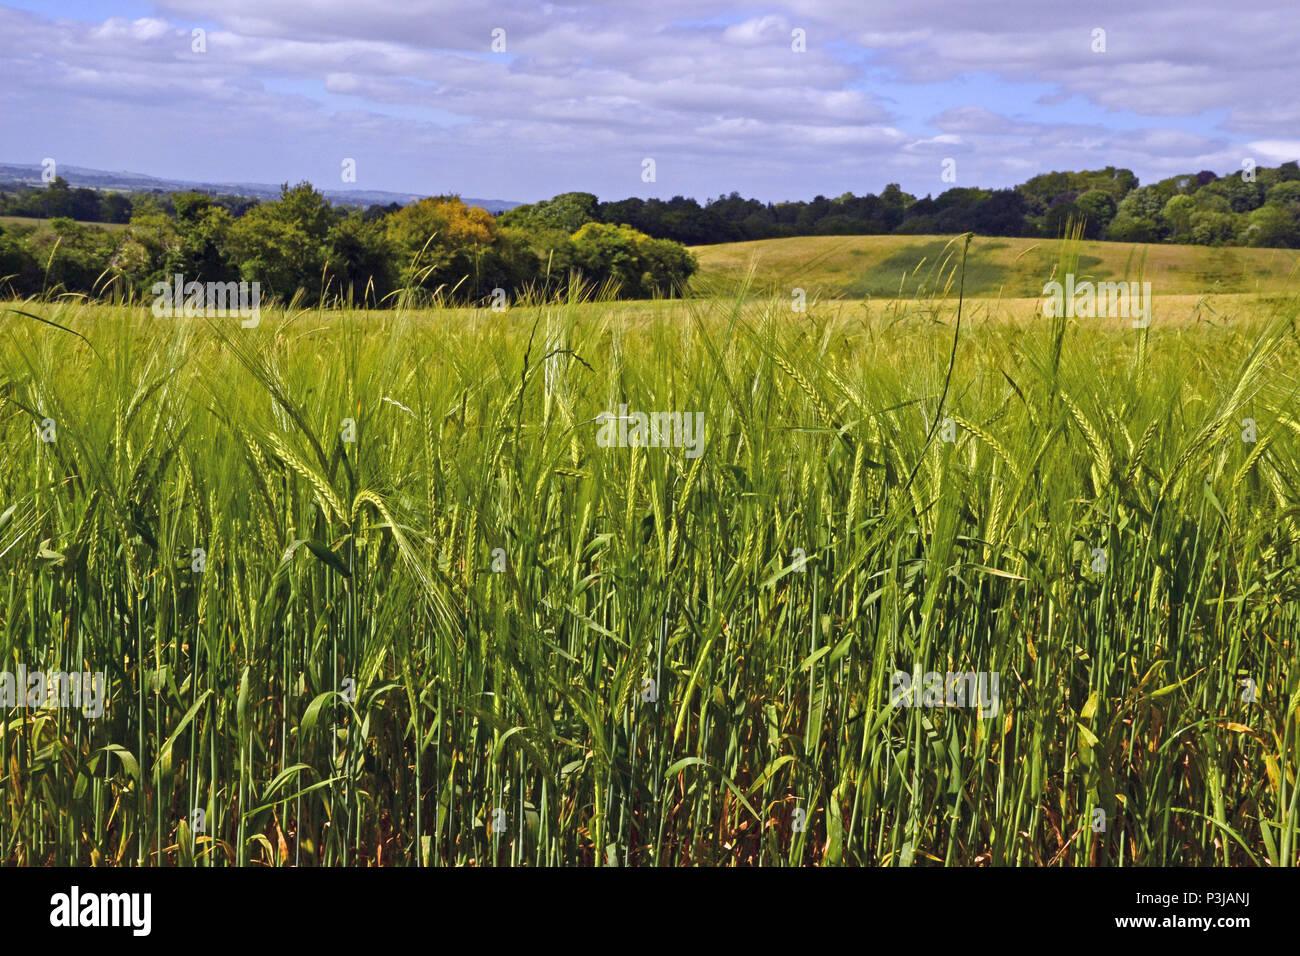 Brush Hill, Princes Risborough, Bucks, Chilterns